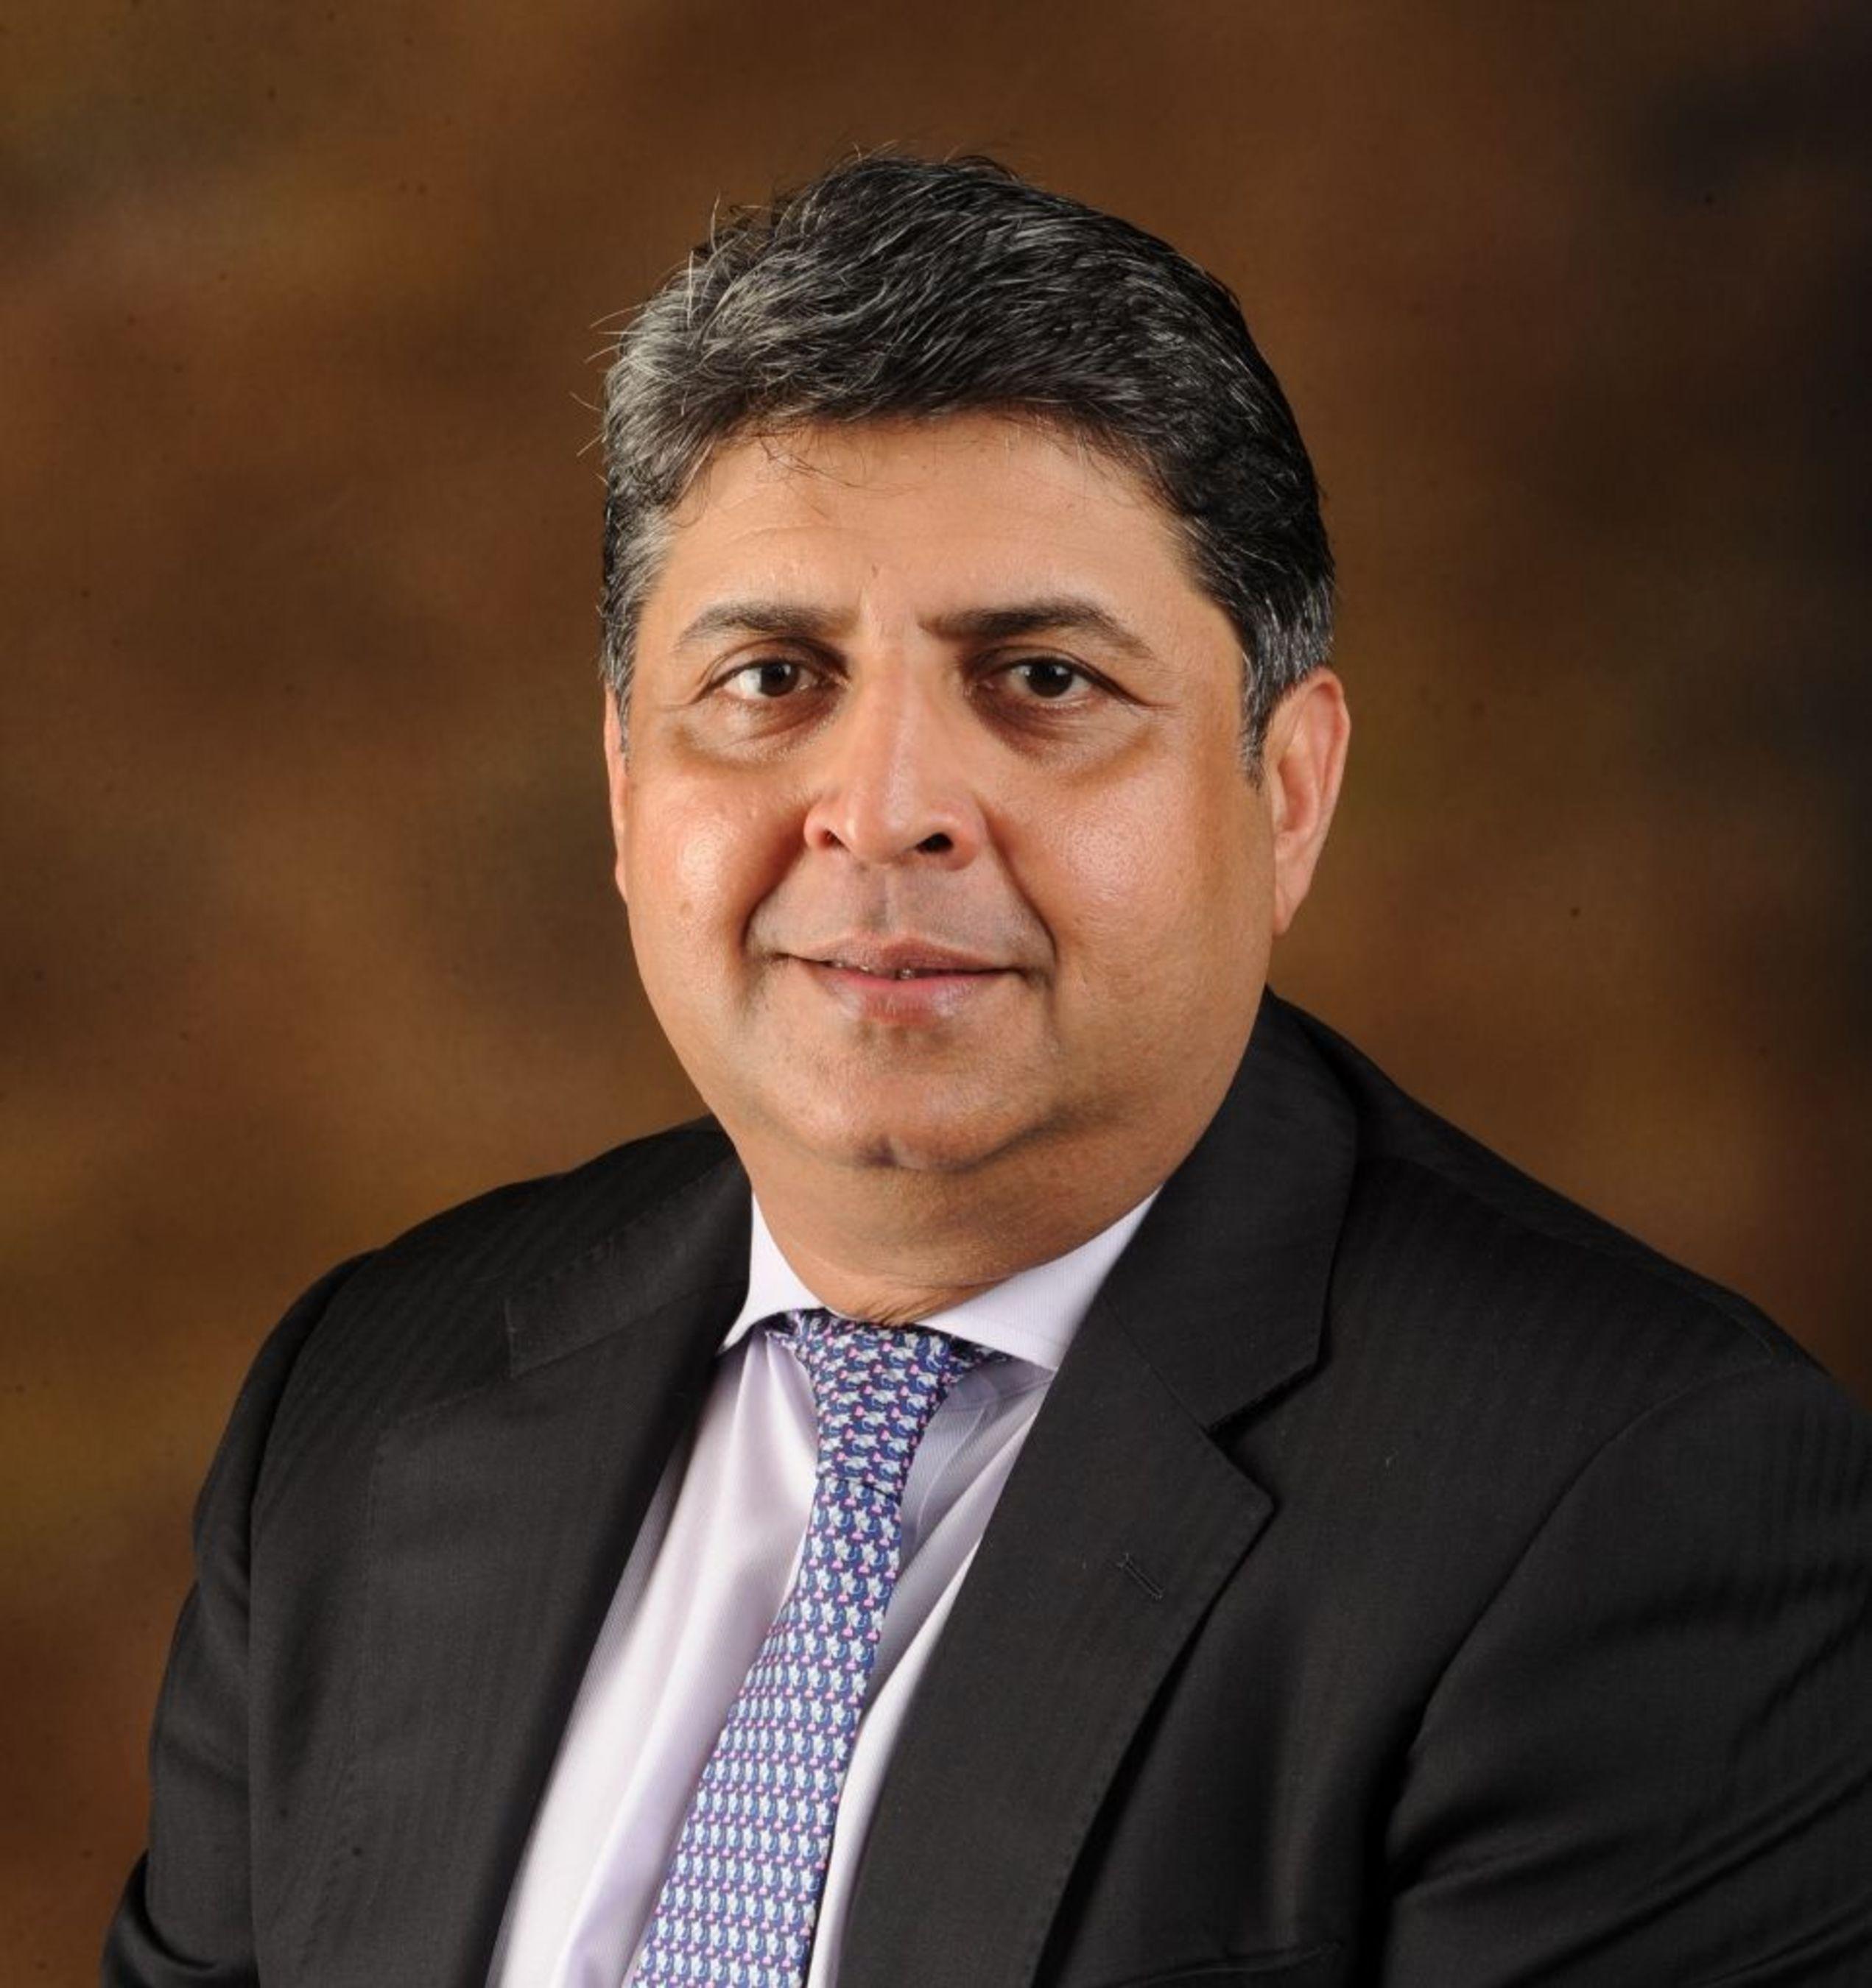 PR NEWSWIRE INDIA - Sanjay Tugnait, EVP, Head of Sales - North America and Global Head of Alliances, iGATE (PRNewsFoto/iGATE CORPORATION)